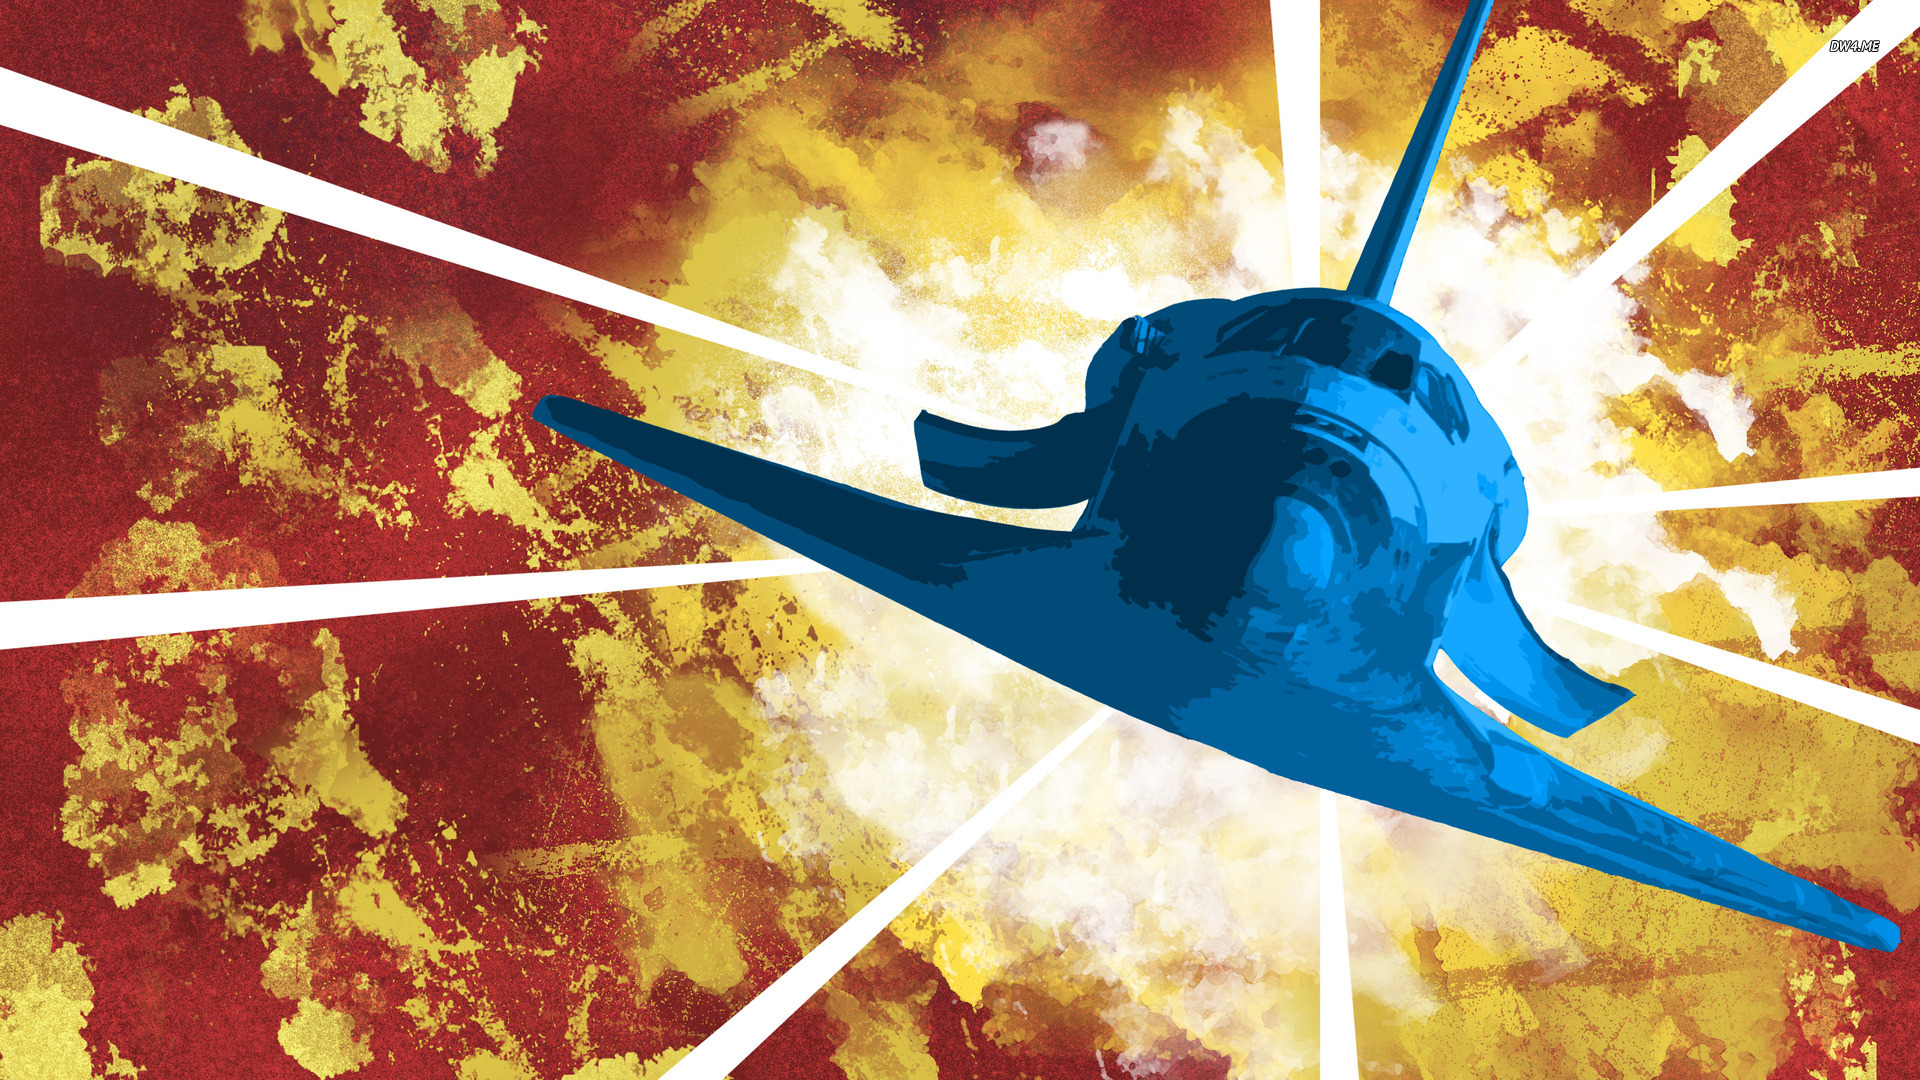 Space shuttle wallpaper - Vector wallpapers - #713